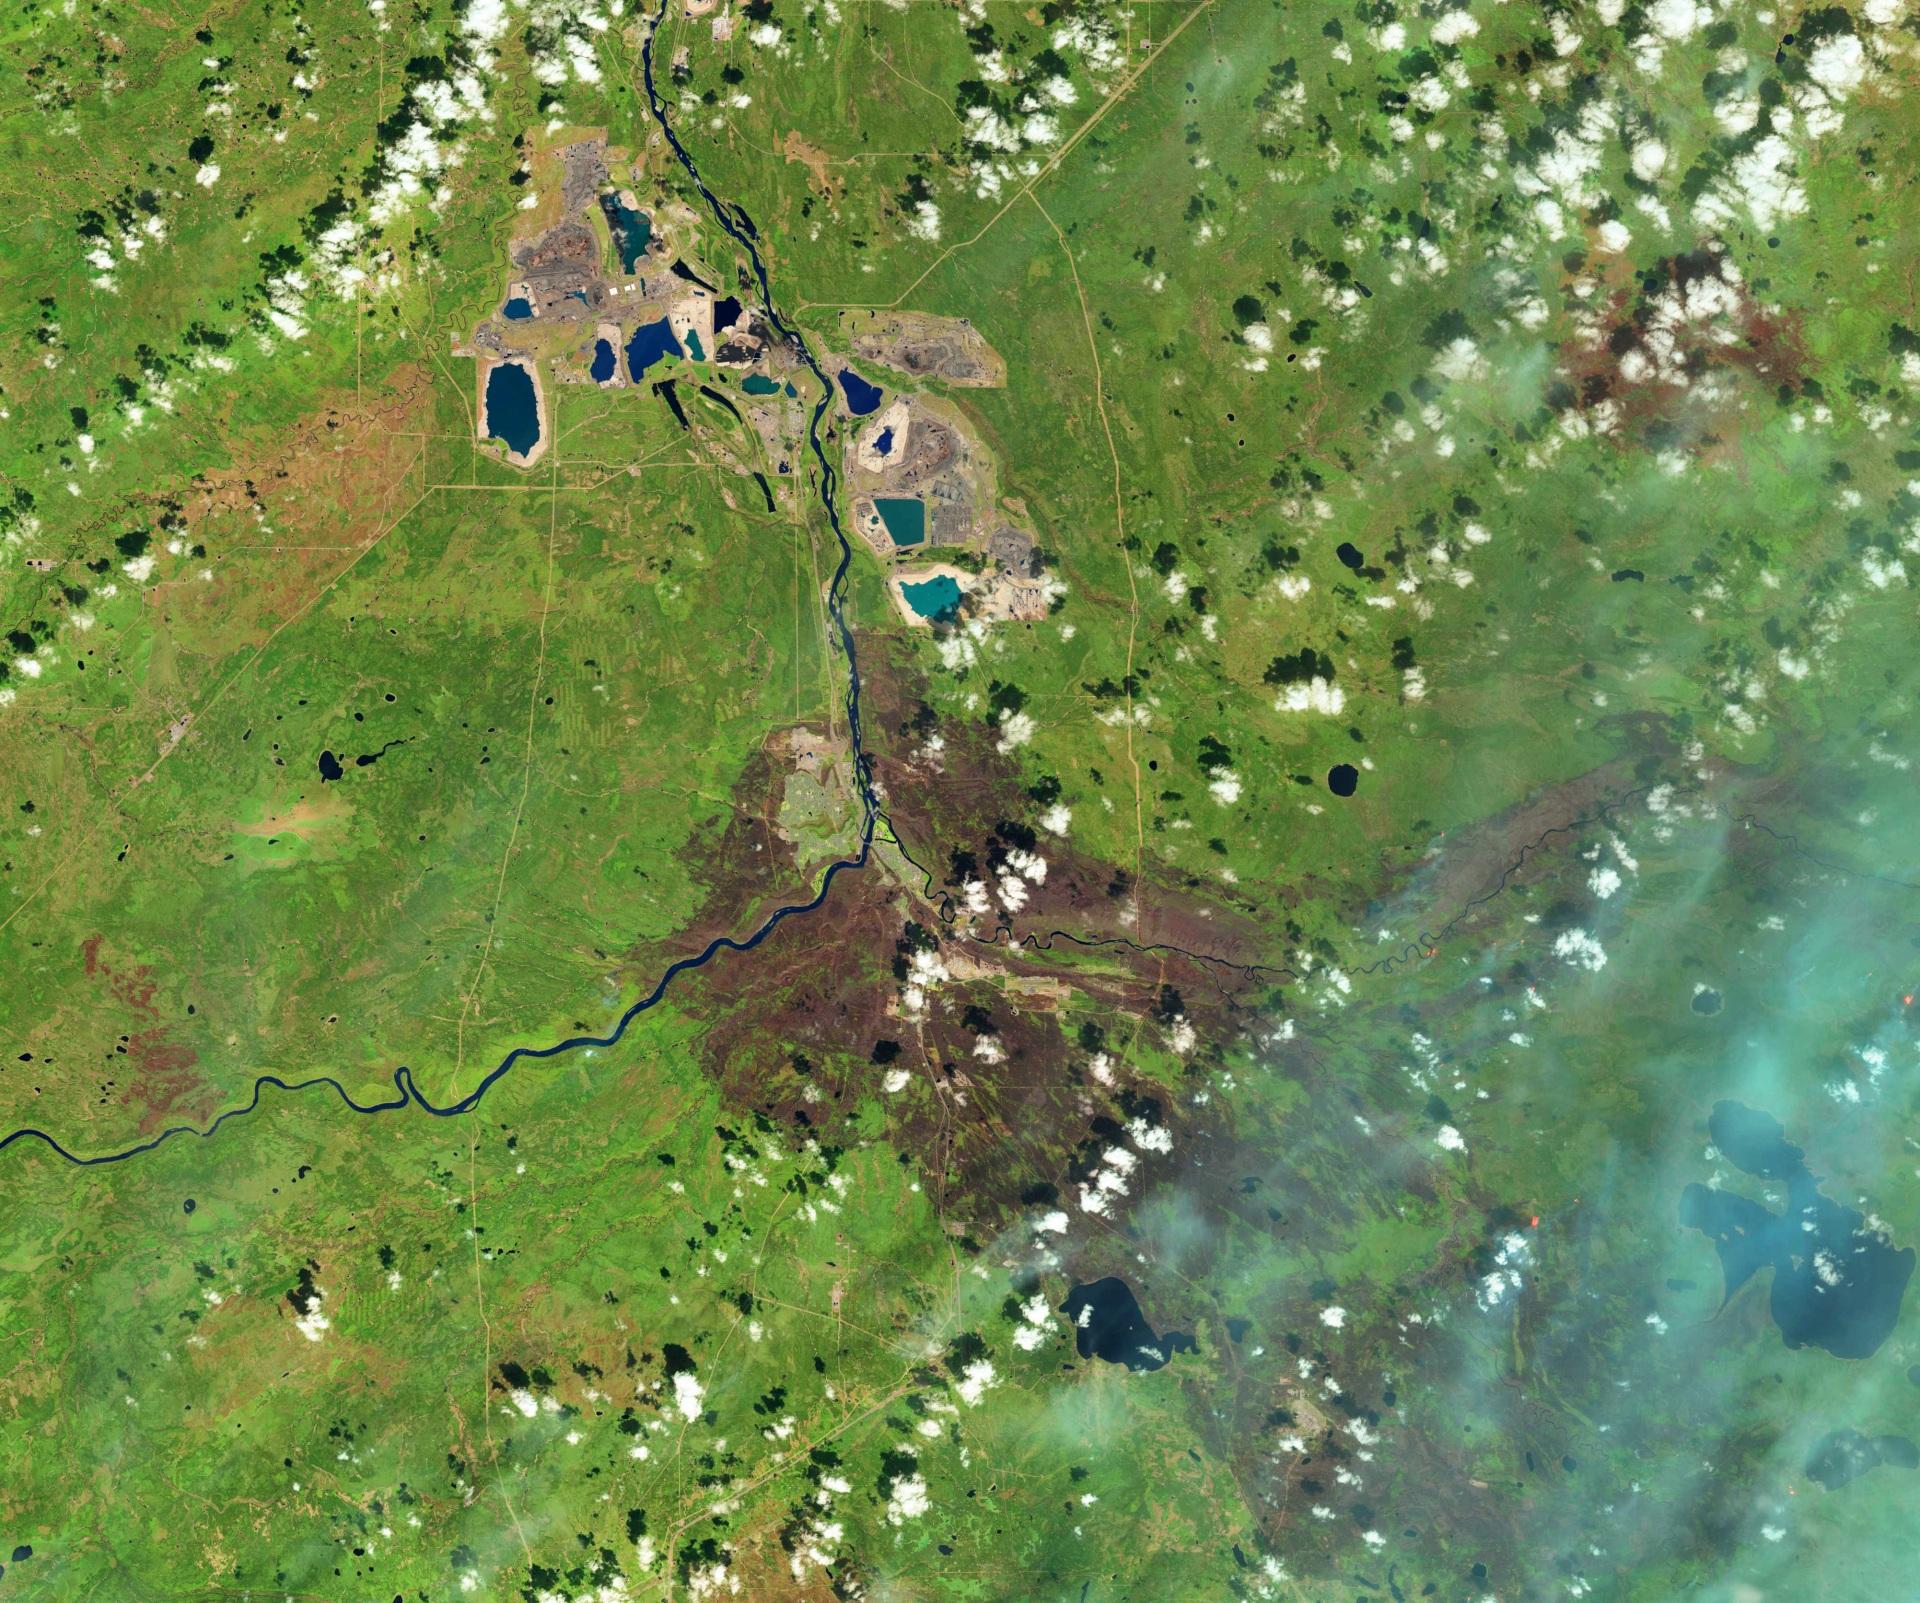 Fort McMurray - Alberta - Incendies - Feux - Wild fires - Landsat 8 - satellite - 12 mai 2016 - Zones brûlées - Burnt scars